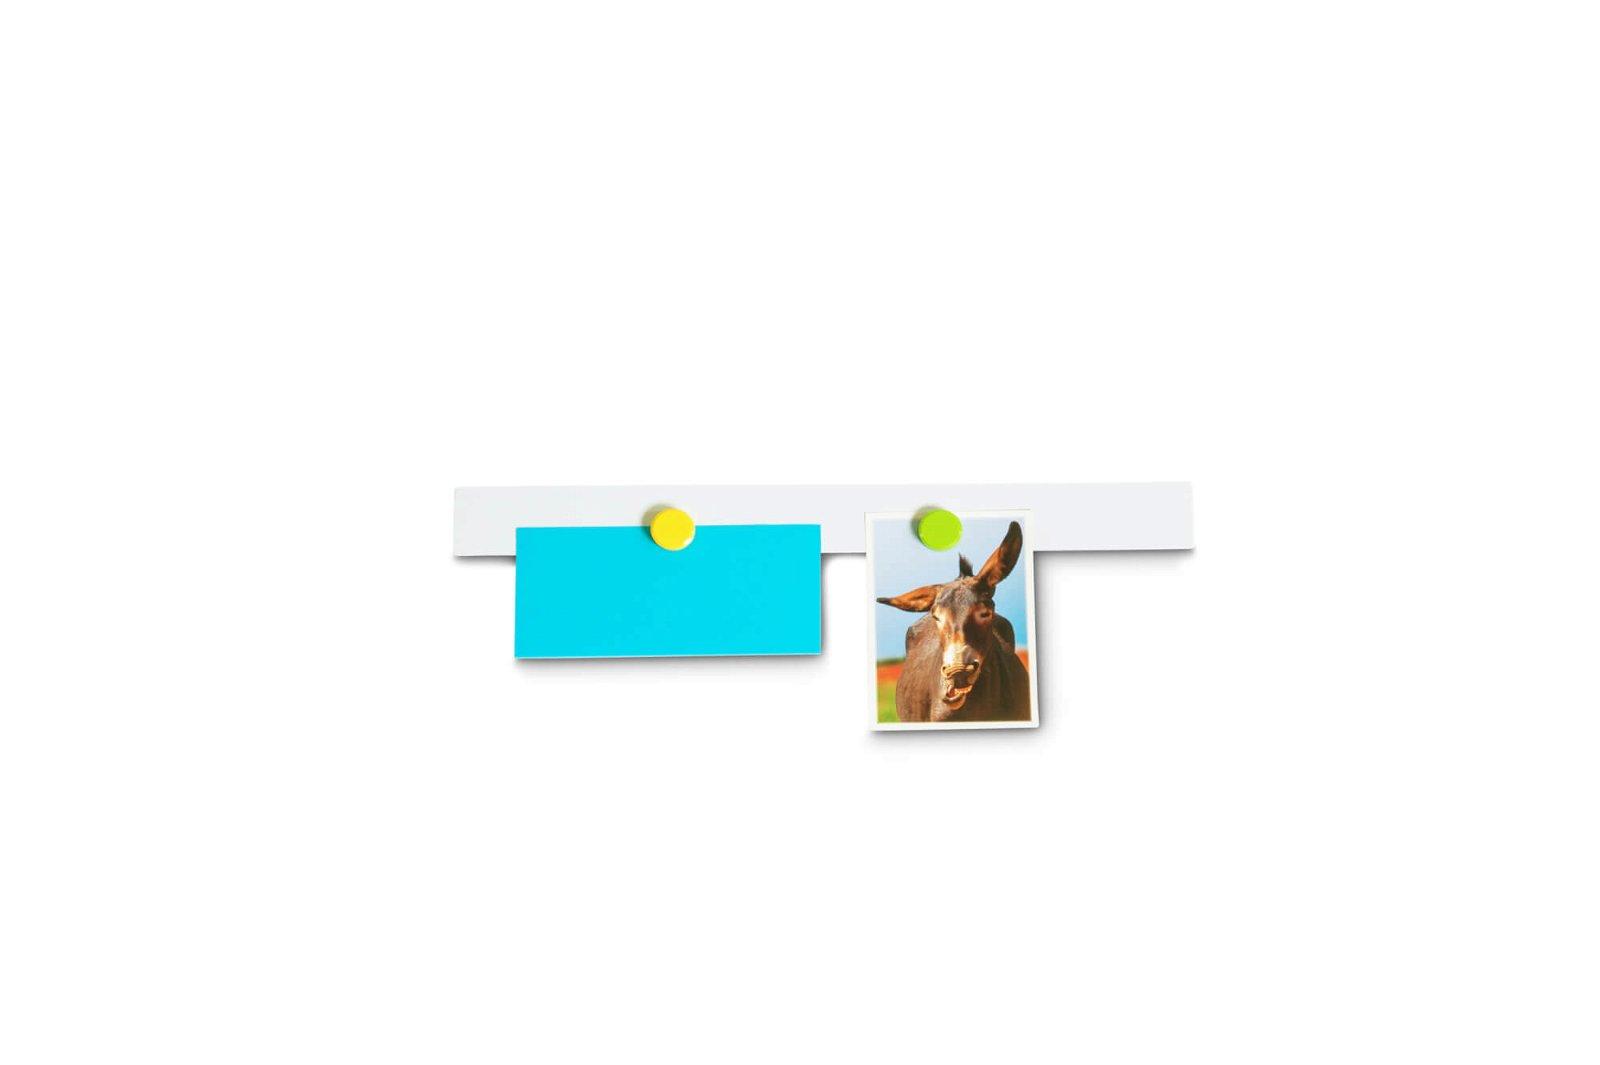 Ferroleiste MAULstandard, Länge 50 cm, weiß